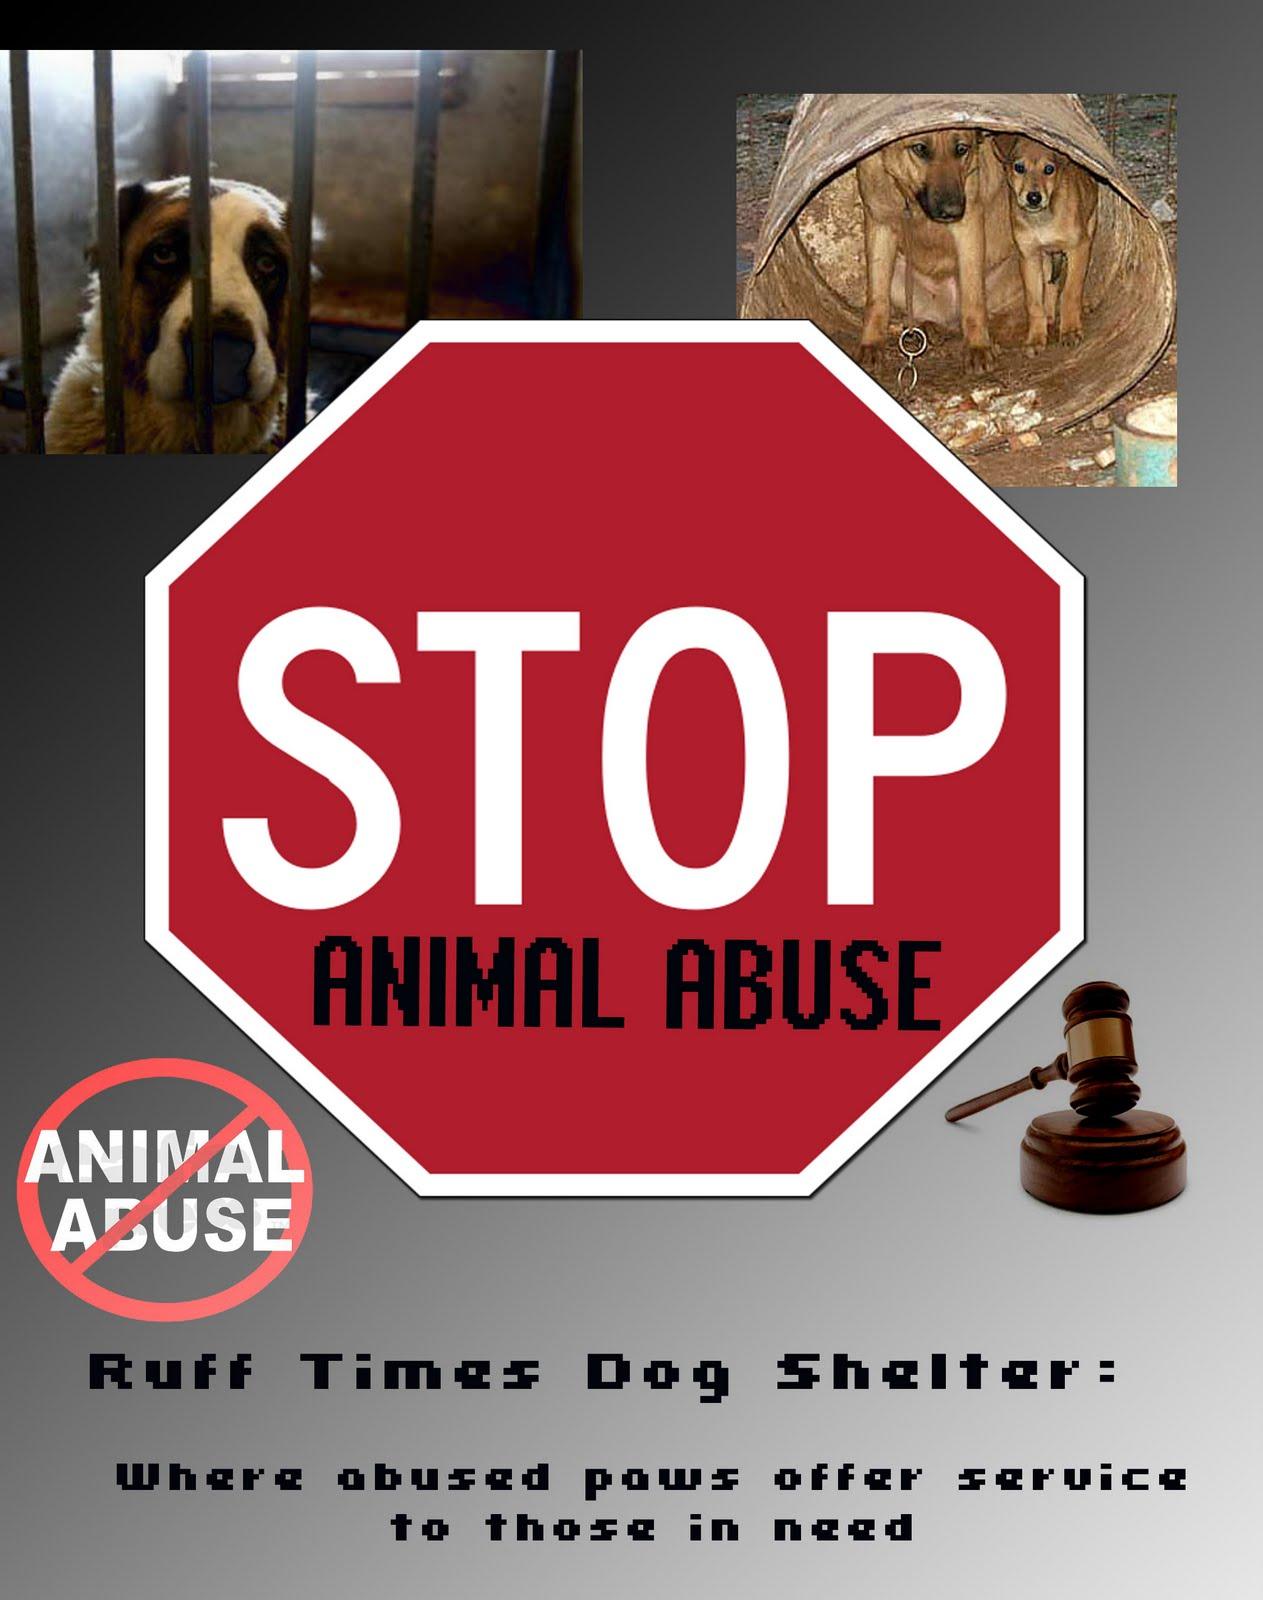 Fighting Animal Abuse